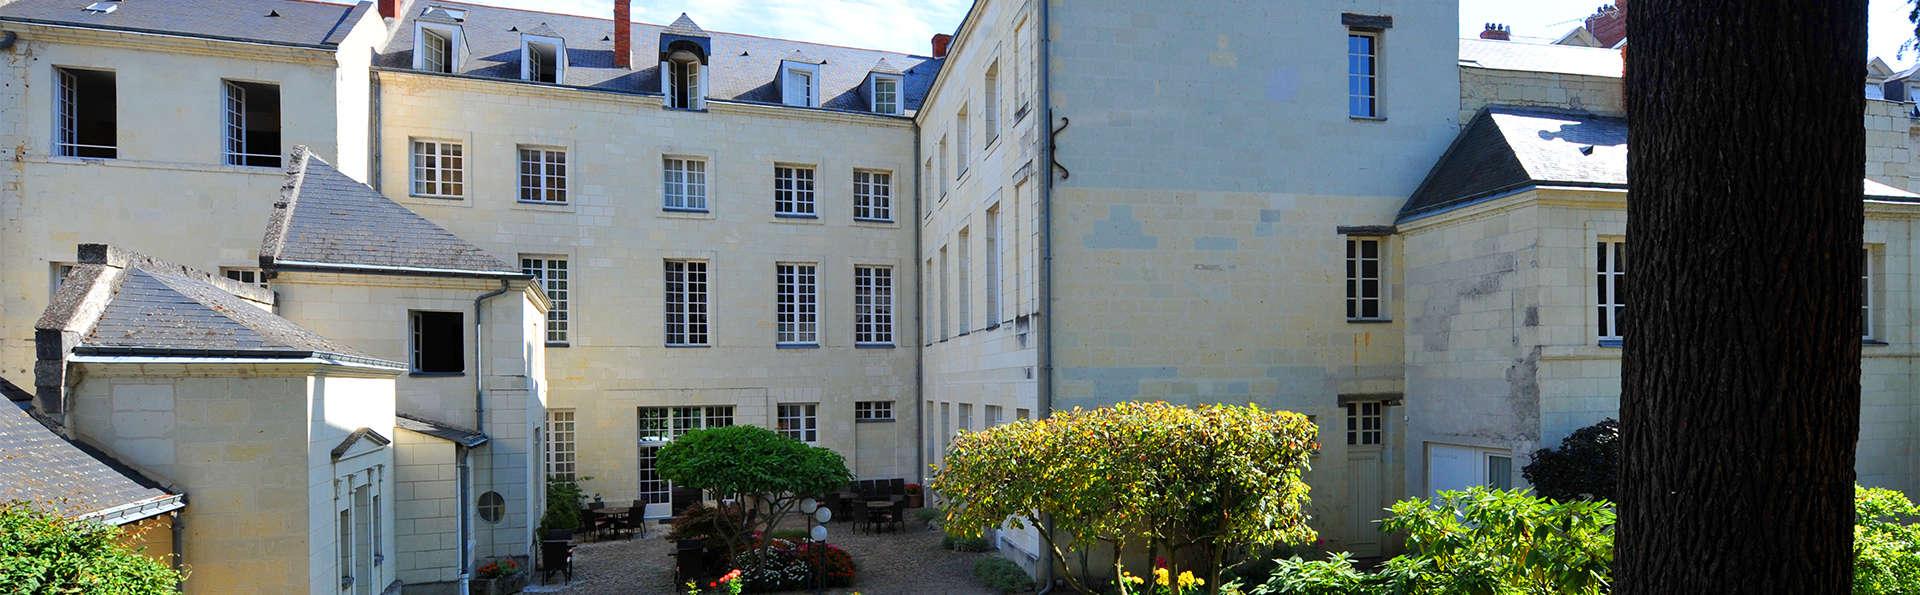 Anne d'Anjou - EDIT_Exterior.jpg